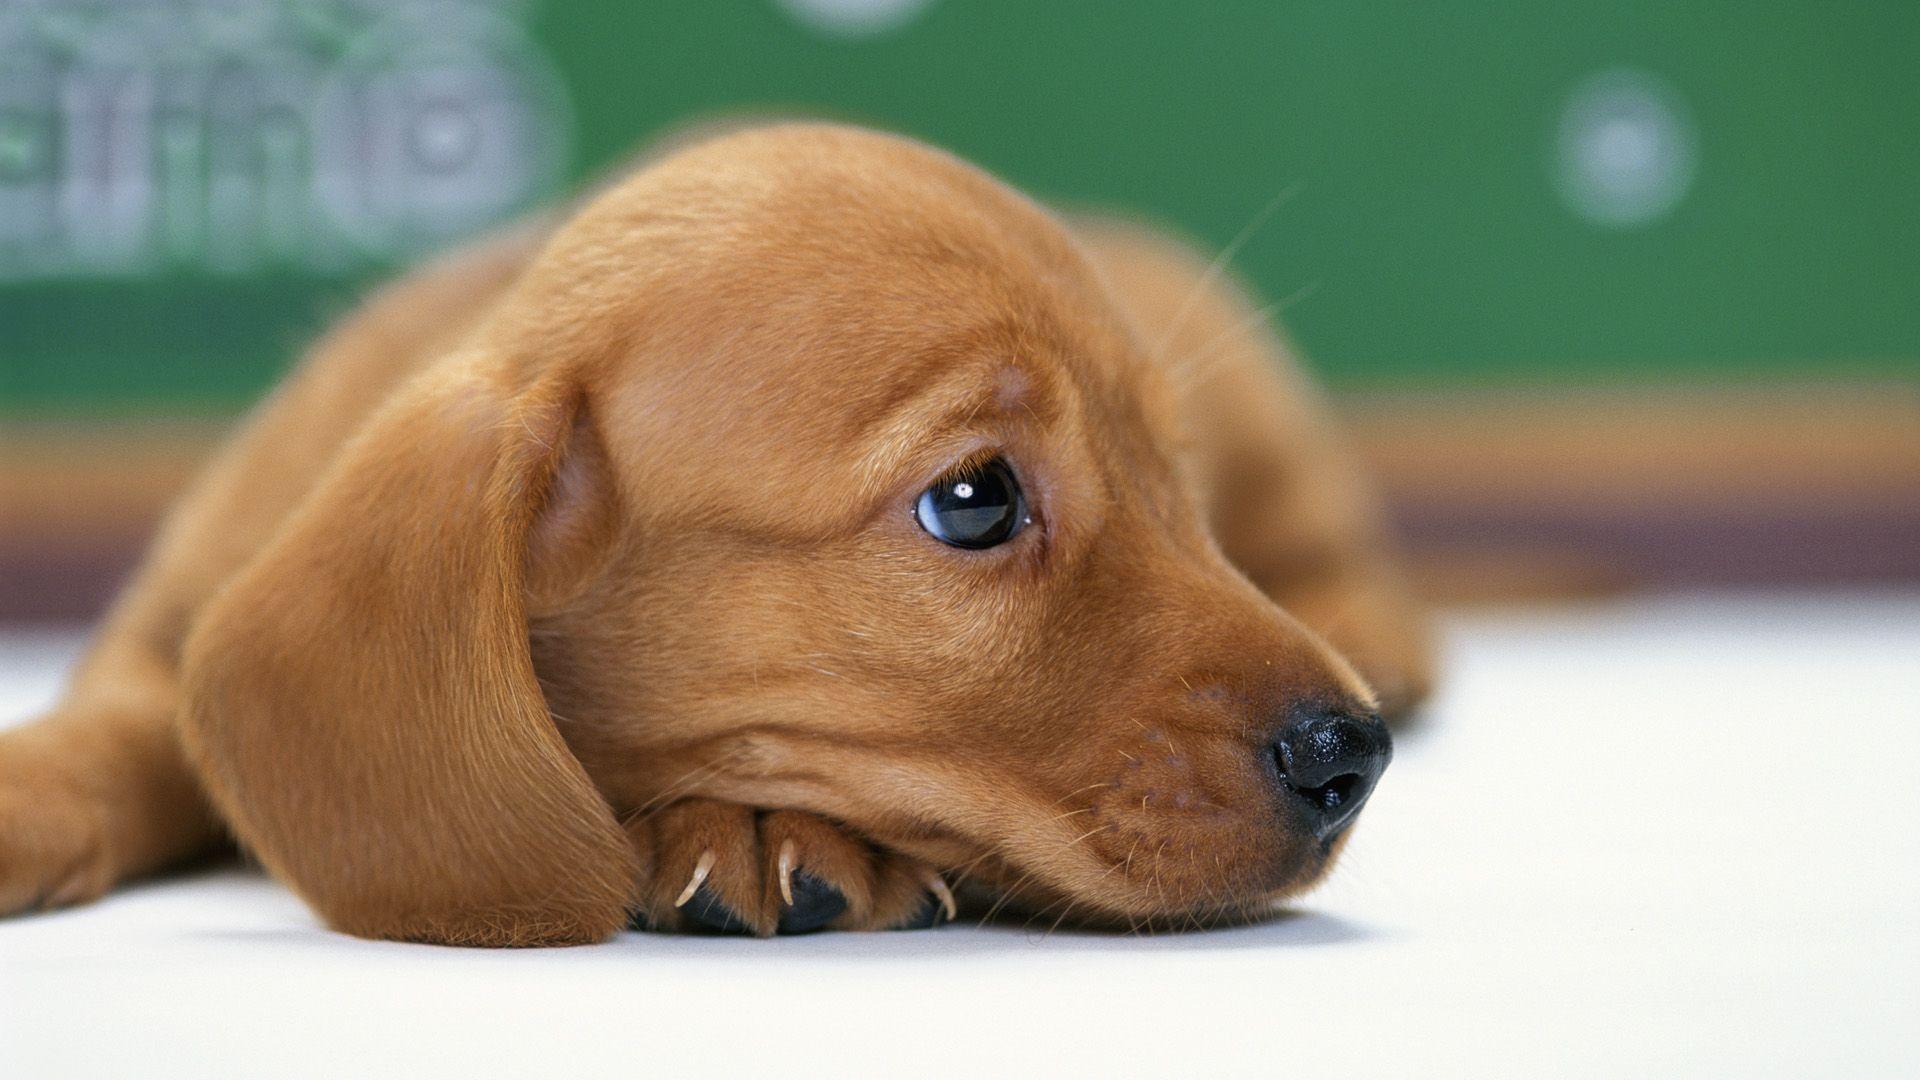 Miniature Dachshund Puppy wallpapers HD free